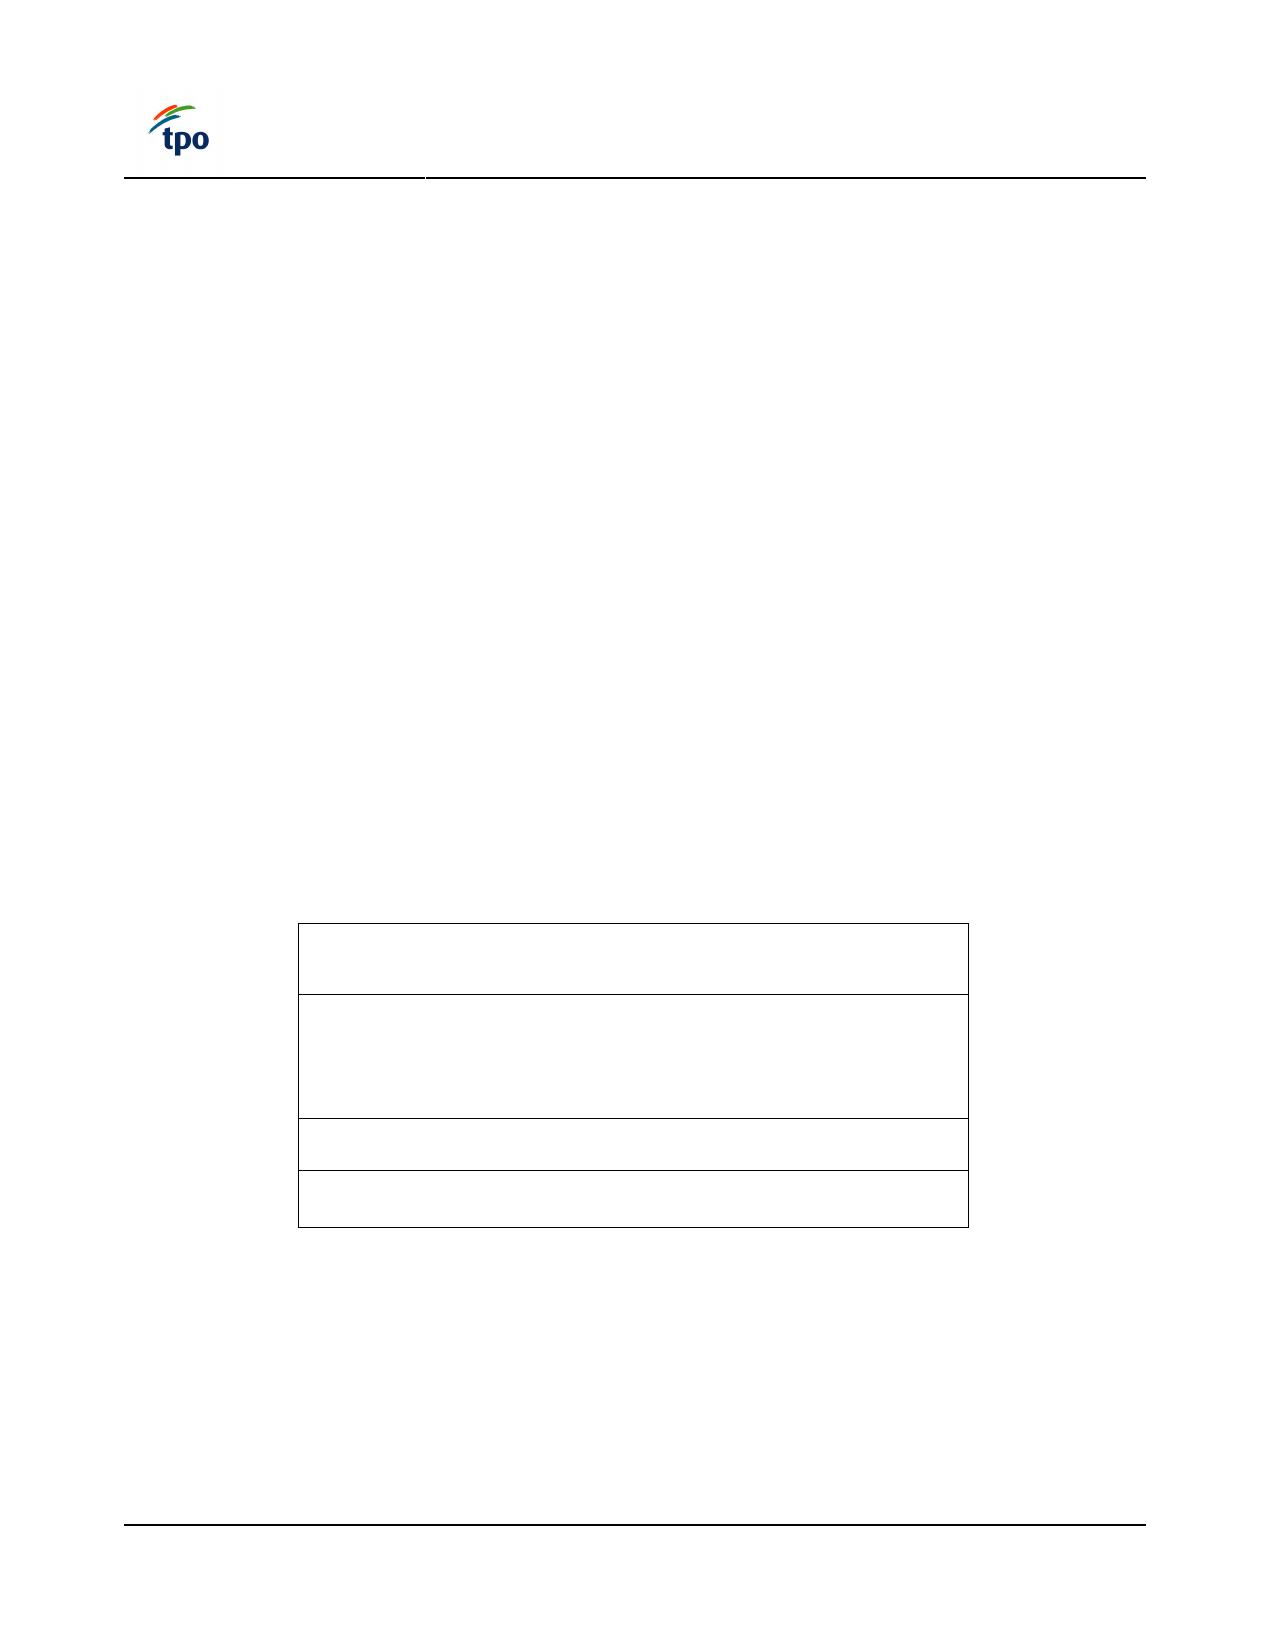 TD080WGCA1 datasheet